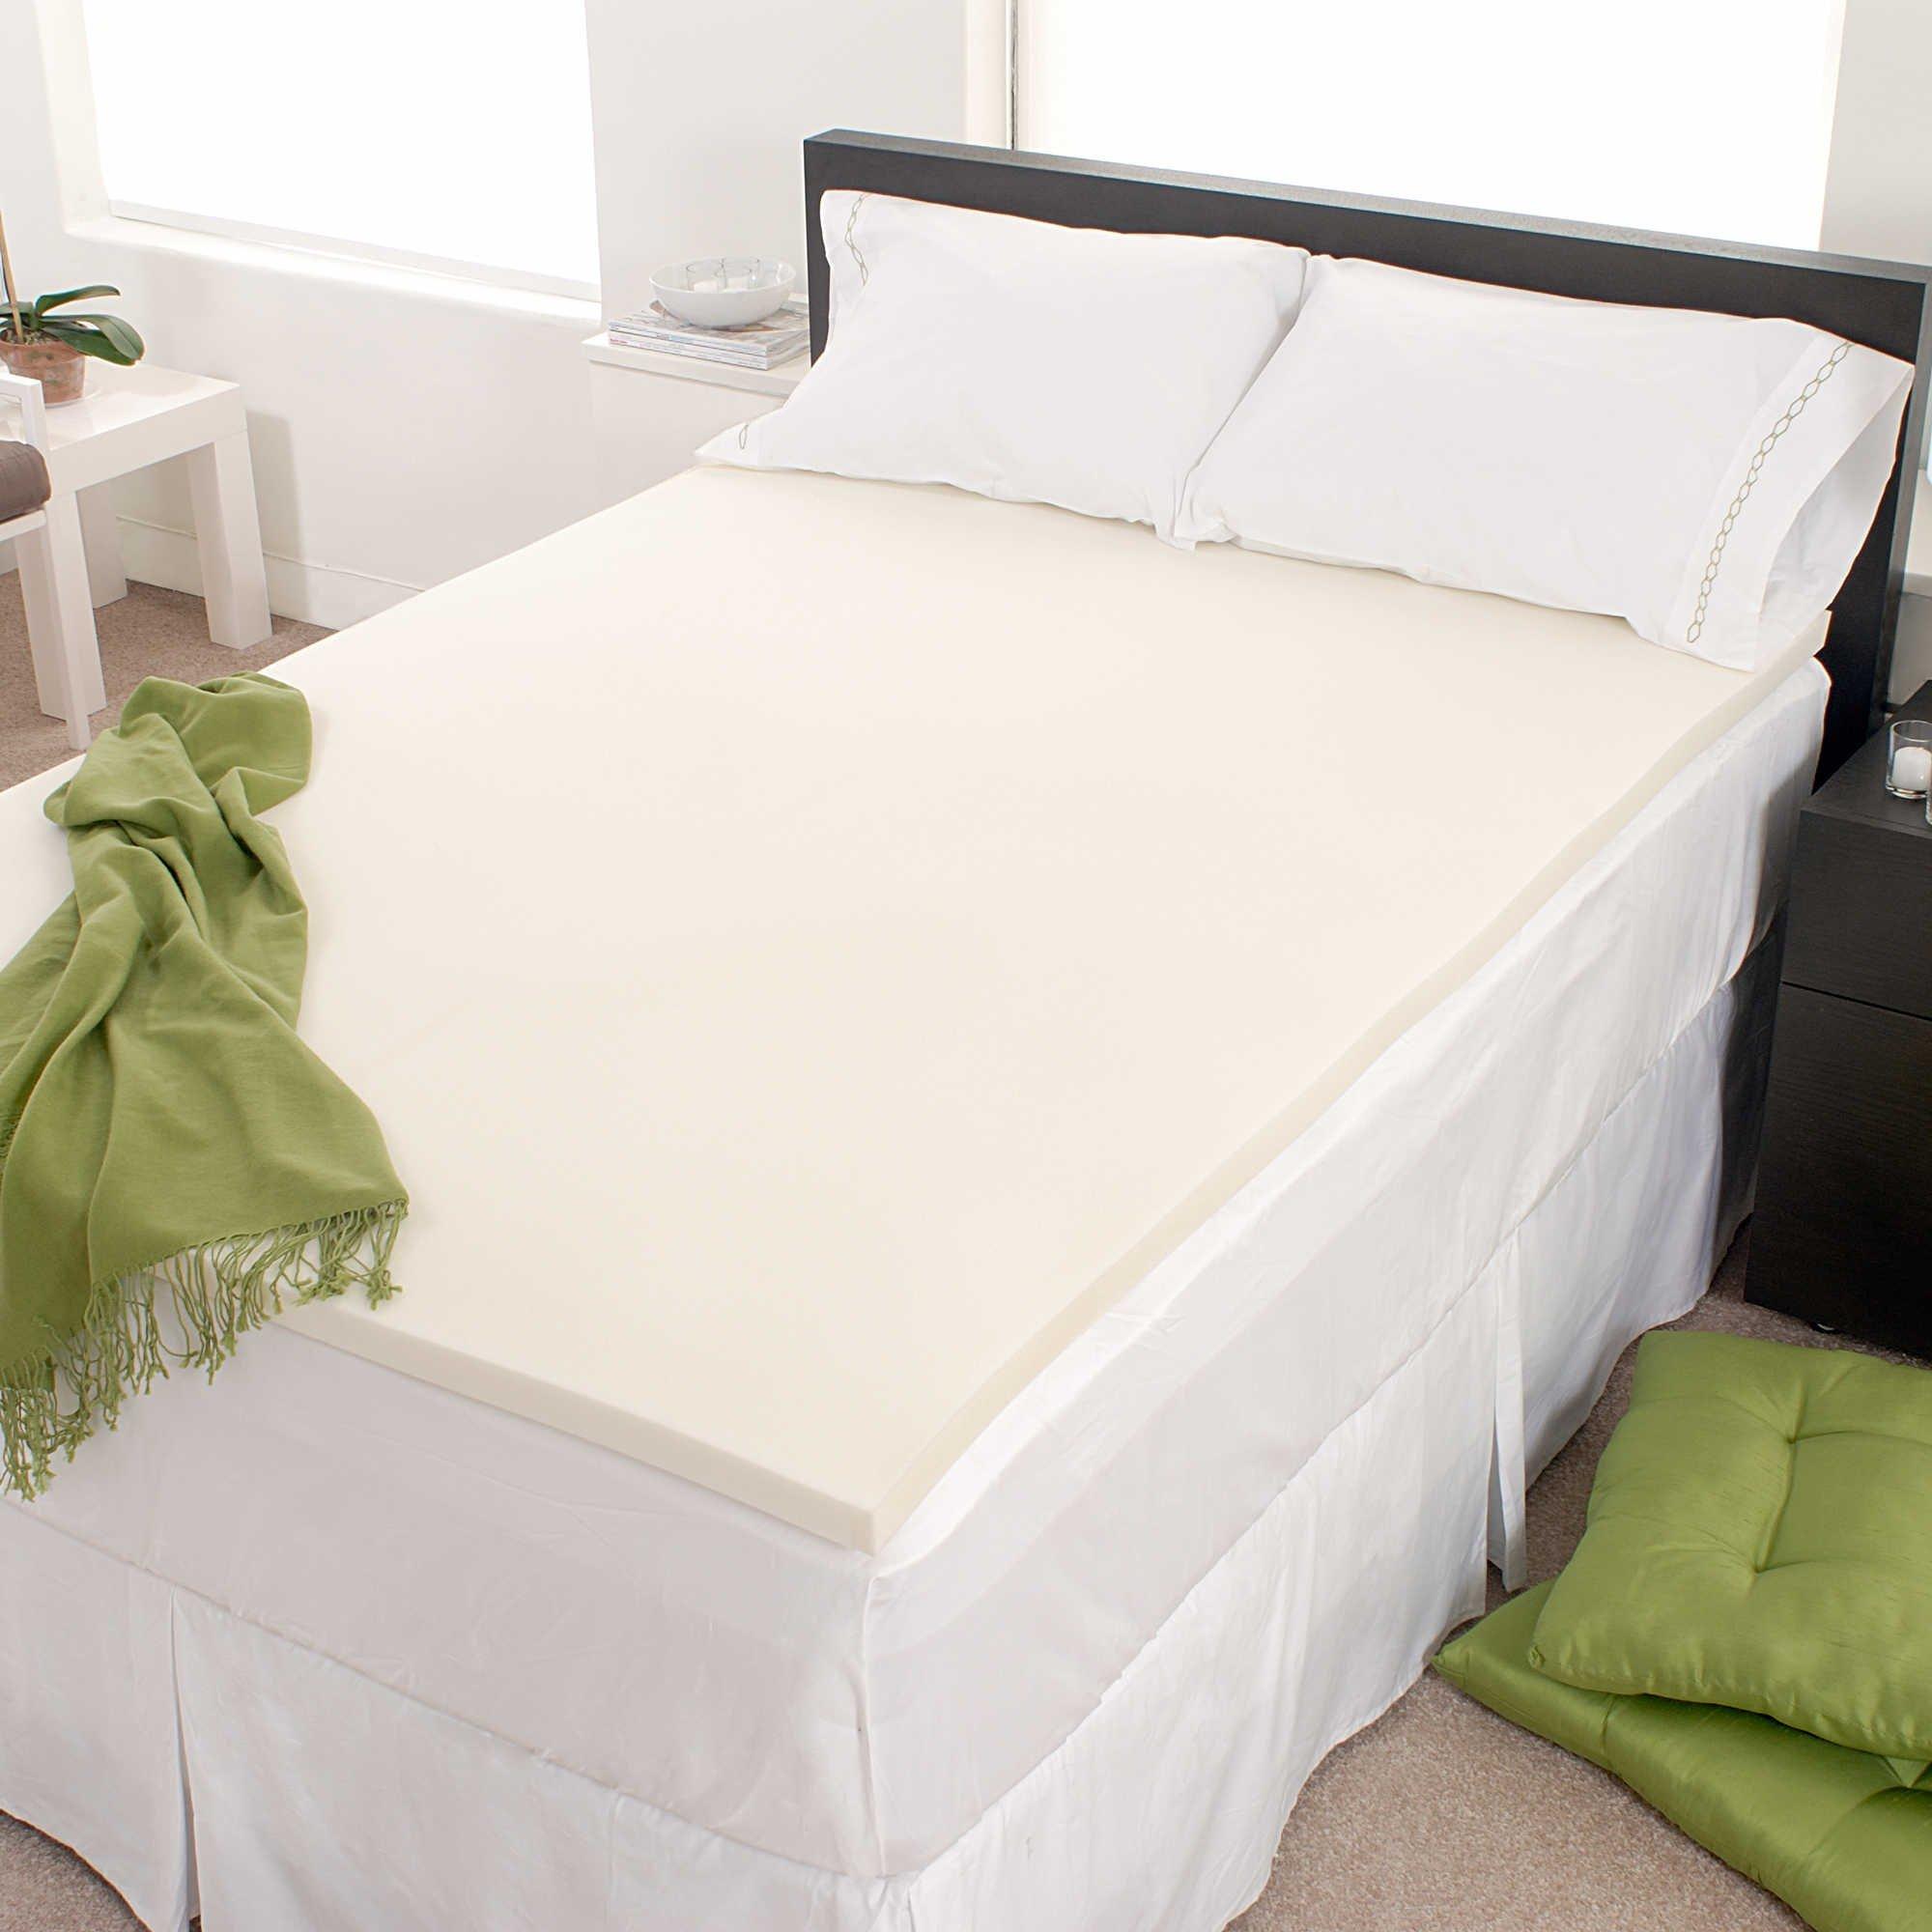 FoamRush 1'' Thick King Size Memory Foam Pad Mattress Topper Made in USA